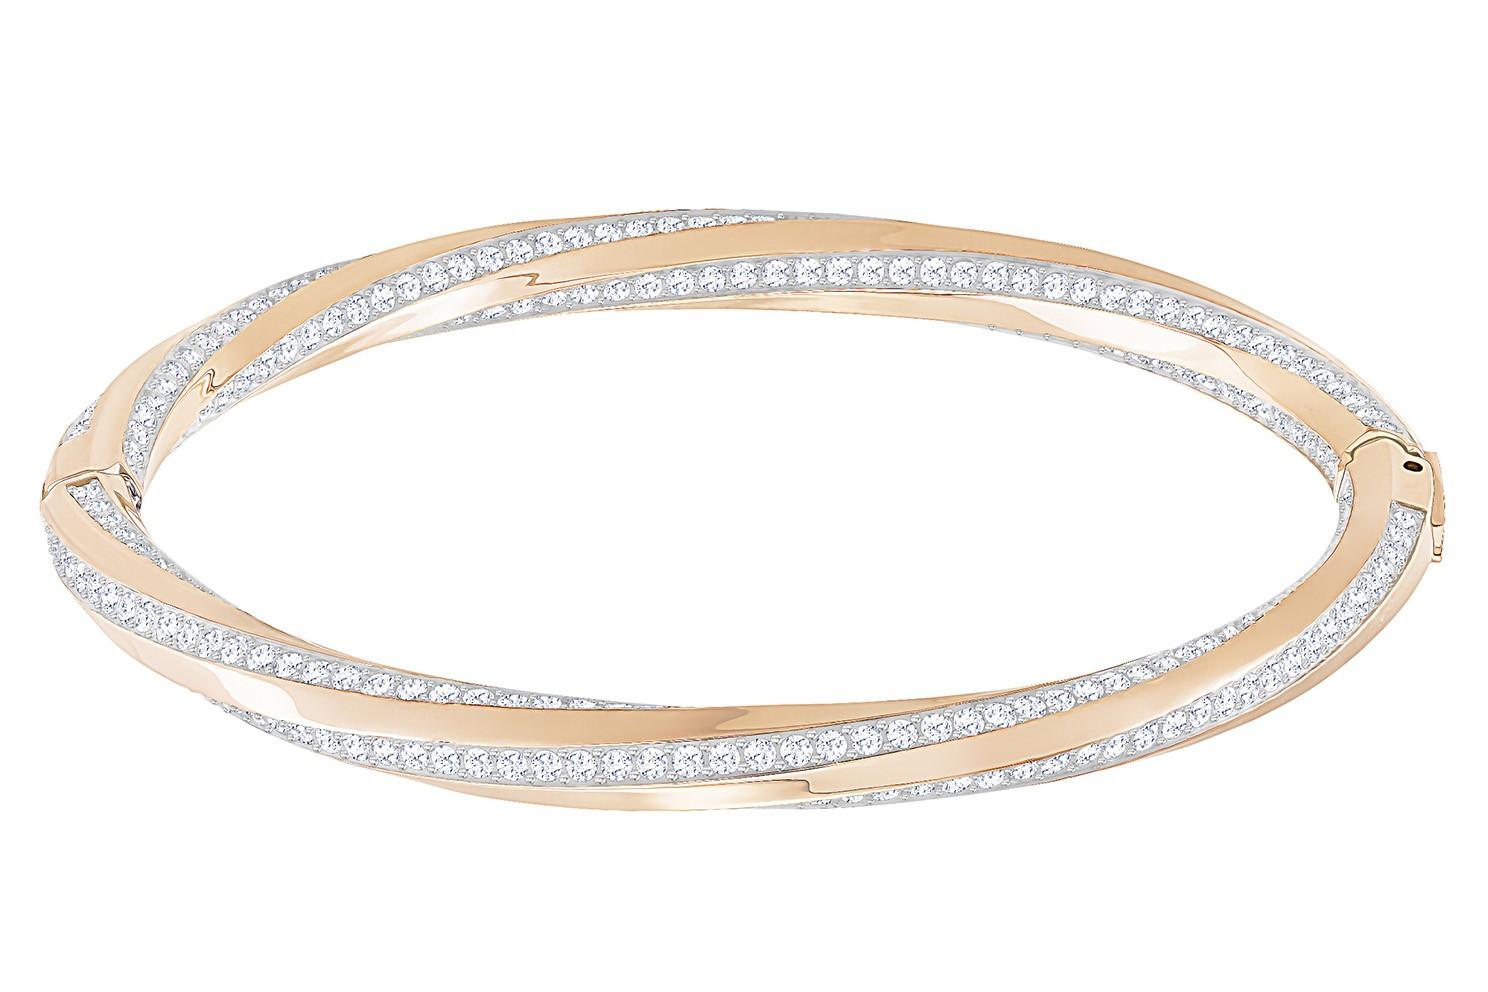 Swarovski Armband Hilt Bangle rosékleurig L 5372856